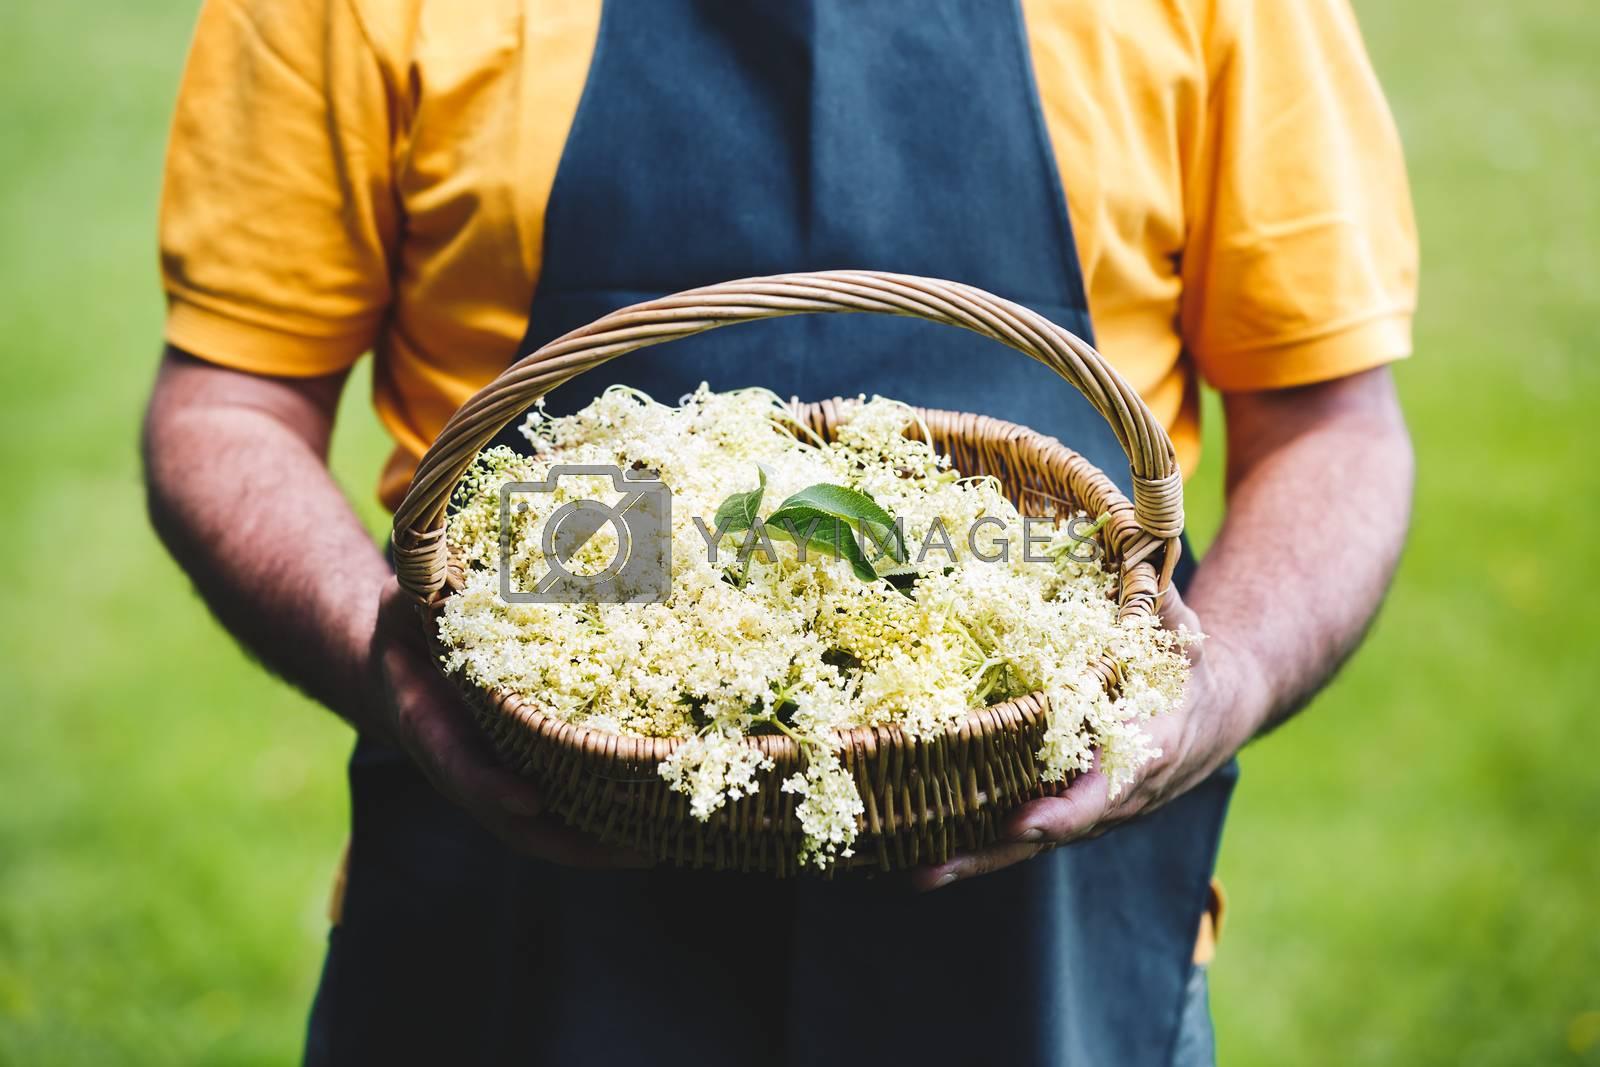 Man  Holding Basket Full Of Just Picked Elderflower, selective focus